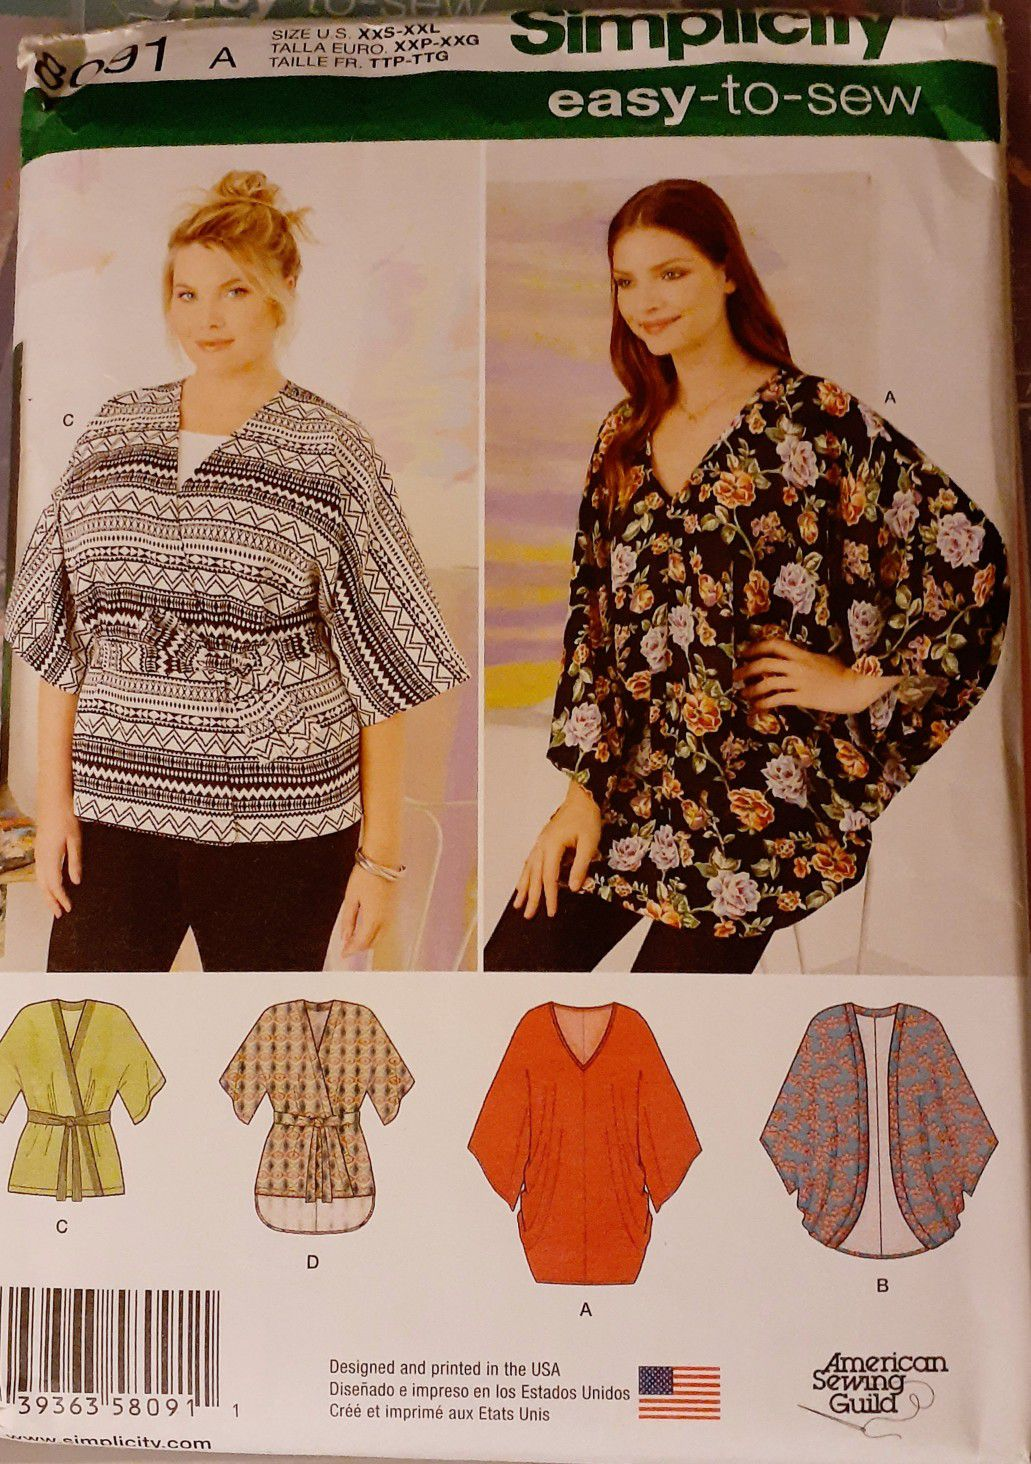 Simplicity 8419 Kimono Top Sewing Pattern